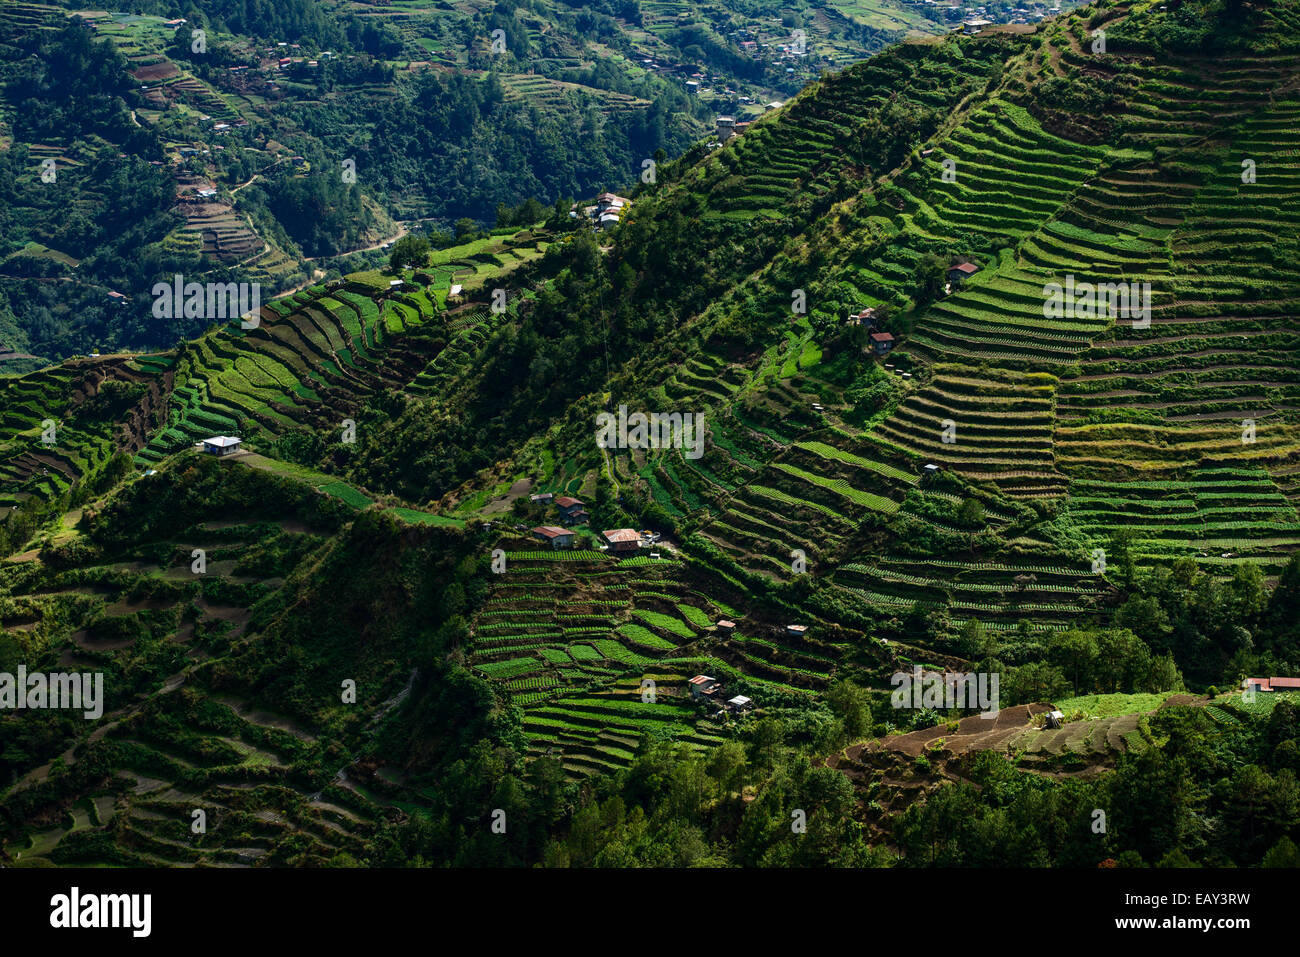 Rice terraces, North Luzon, Philippines - Stock Image